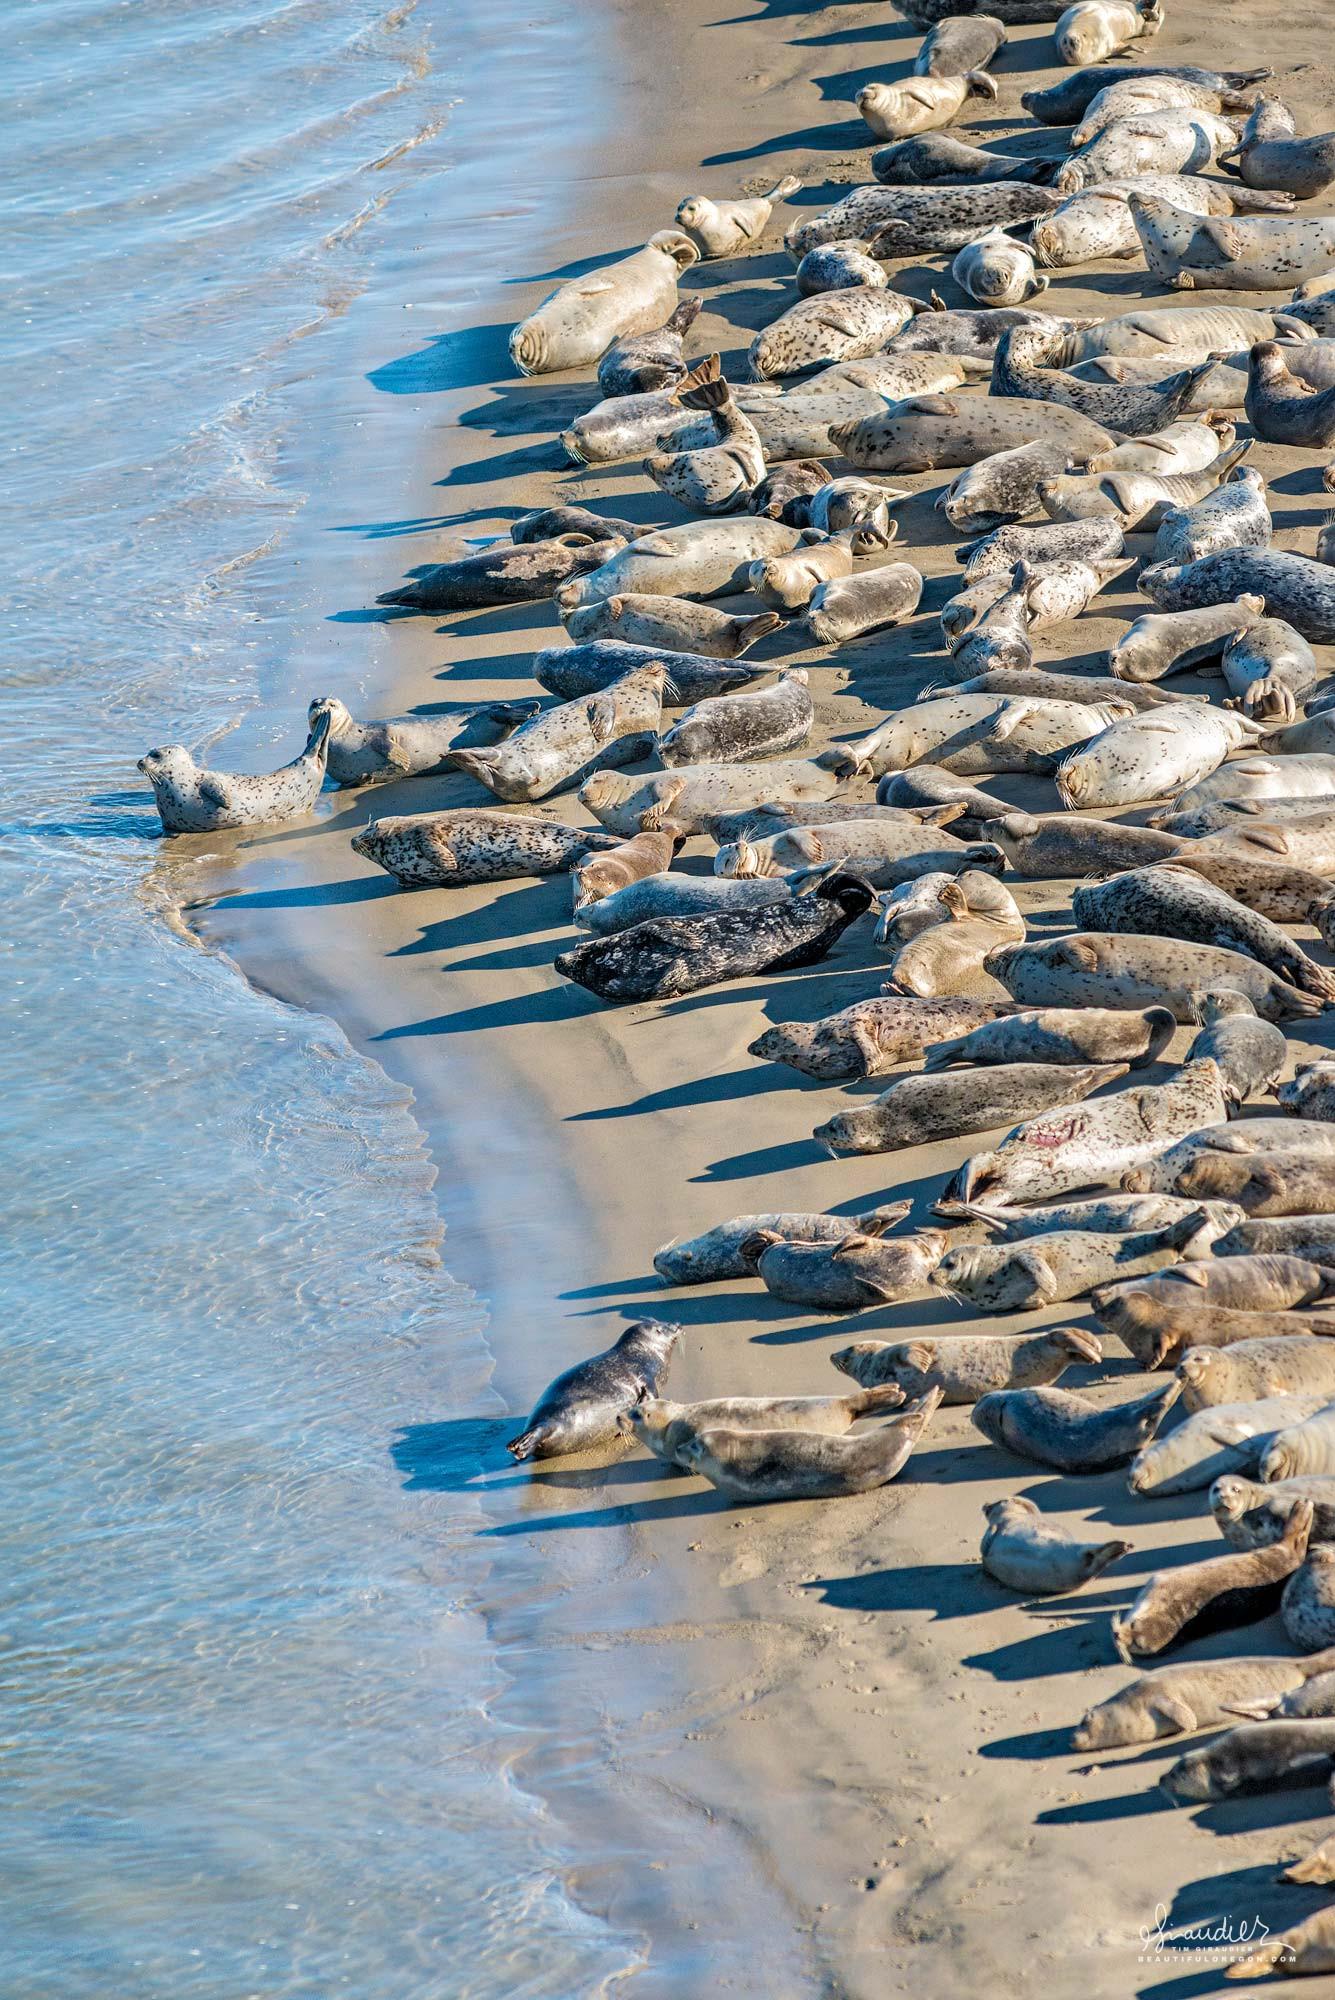 Pacific Harbor Seals (Phoca vitulina richardsi) gather on a sandbar to sun themselves in January. Alsea Bay, Lincoln County, Oregon Central Coast photography.